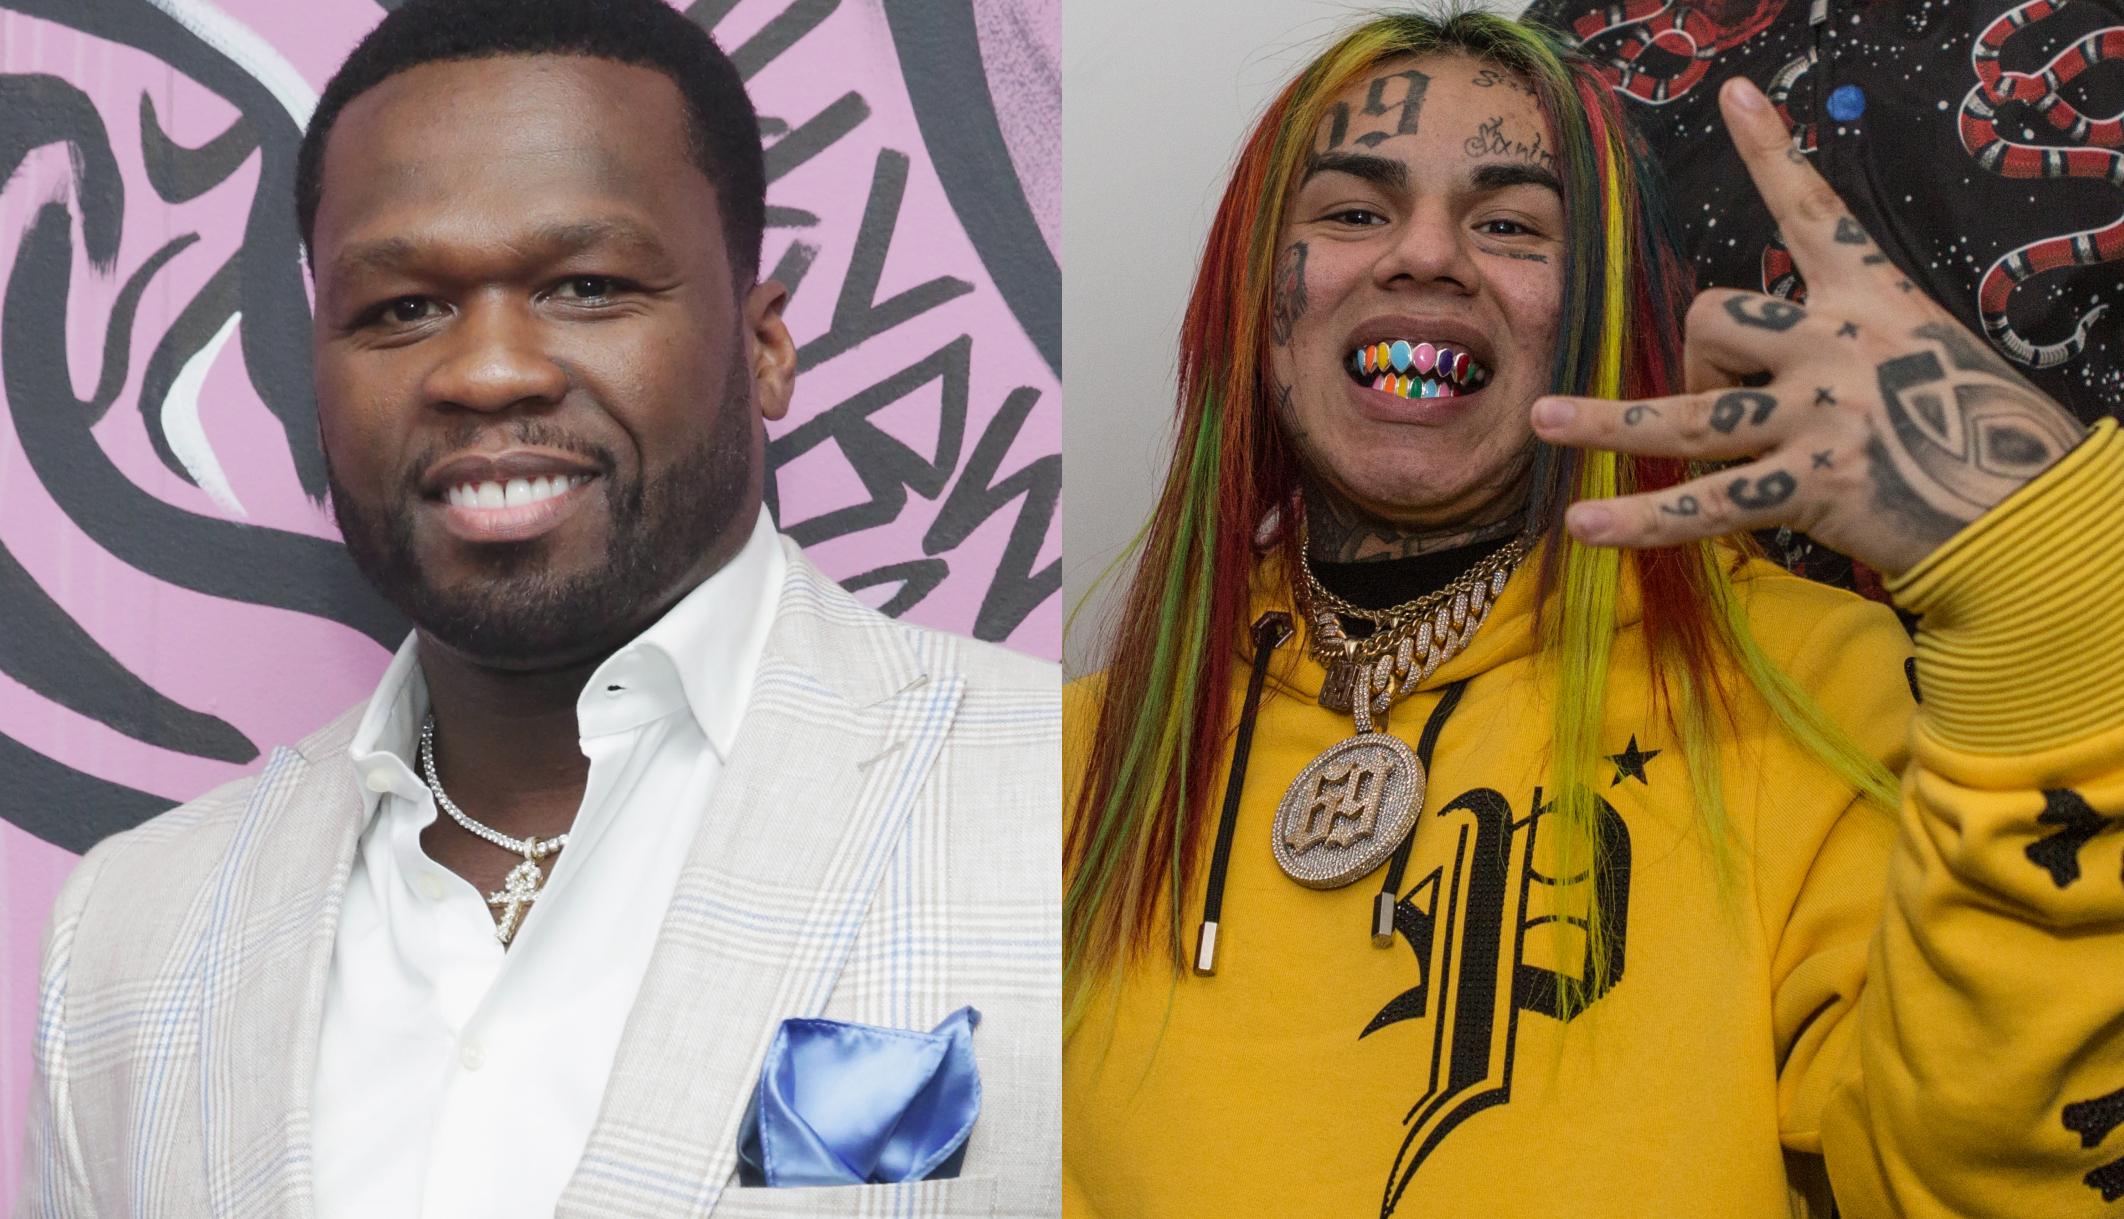 Se informa que Gunman abre fuego en el set de 50 Cent, video musical de Tekashi69